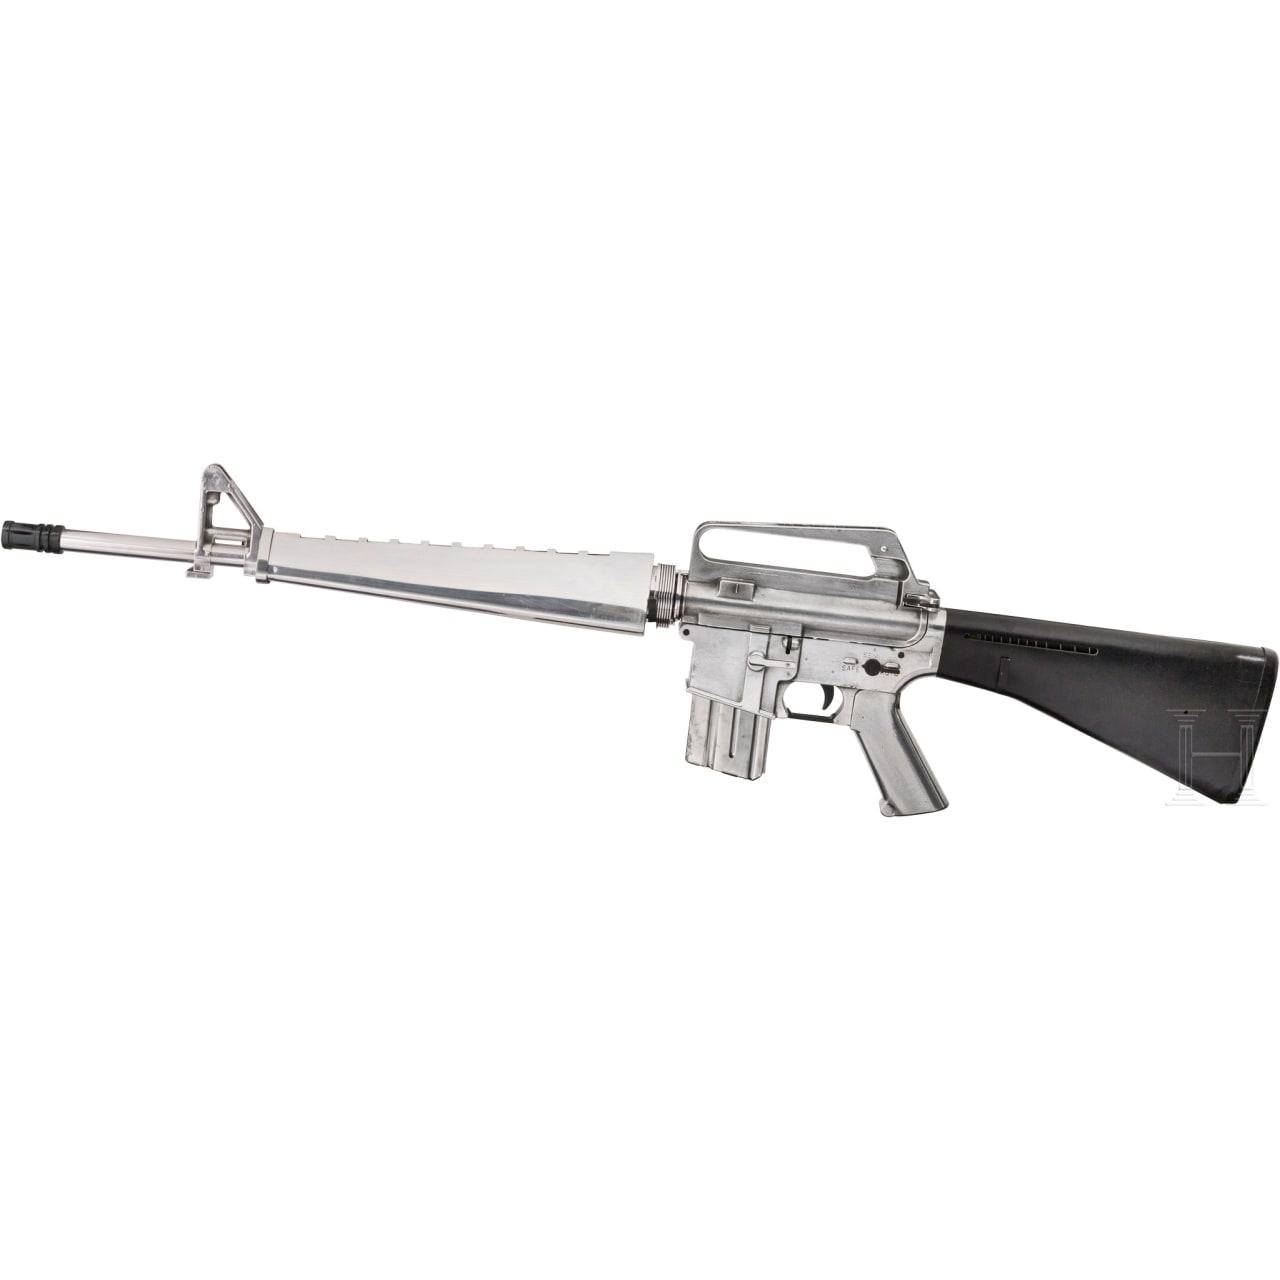 Armalite M16 A2 Demonstrationsmodell